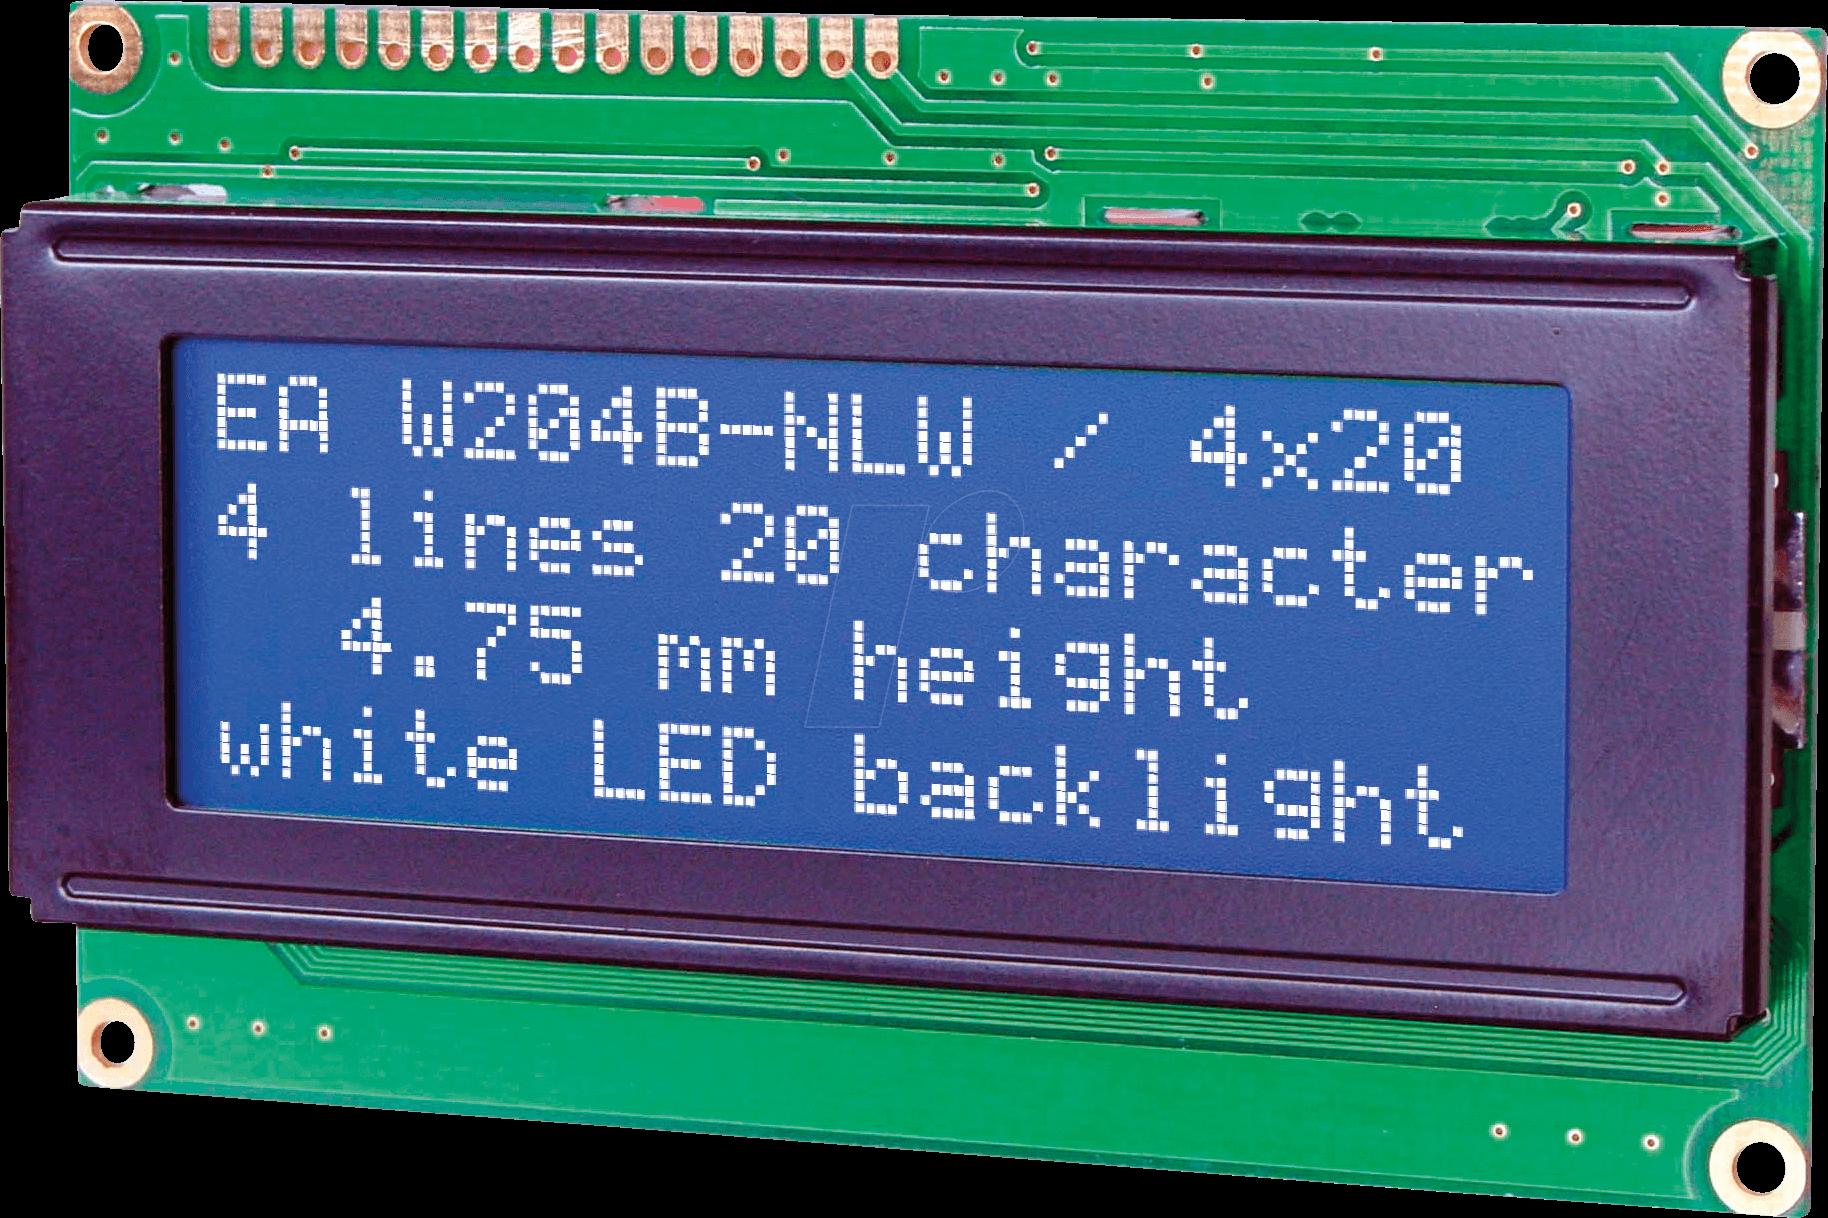 LCD blue display 204B BL LCD enabling 4 x 20 characters